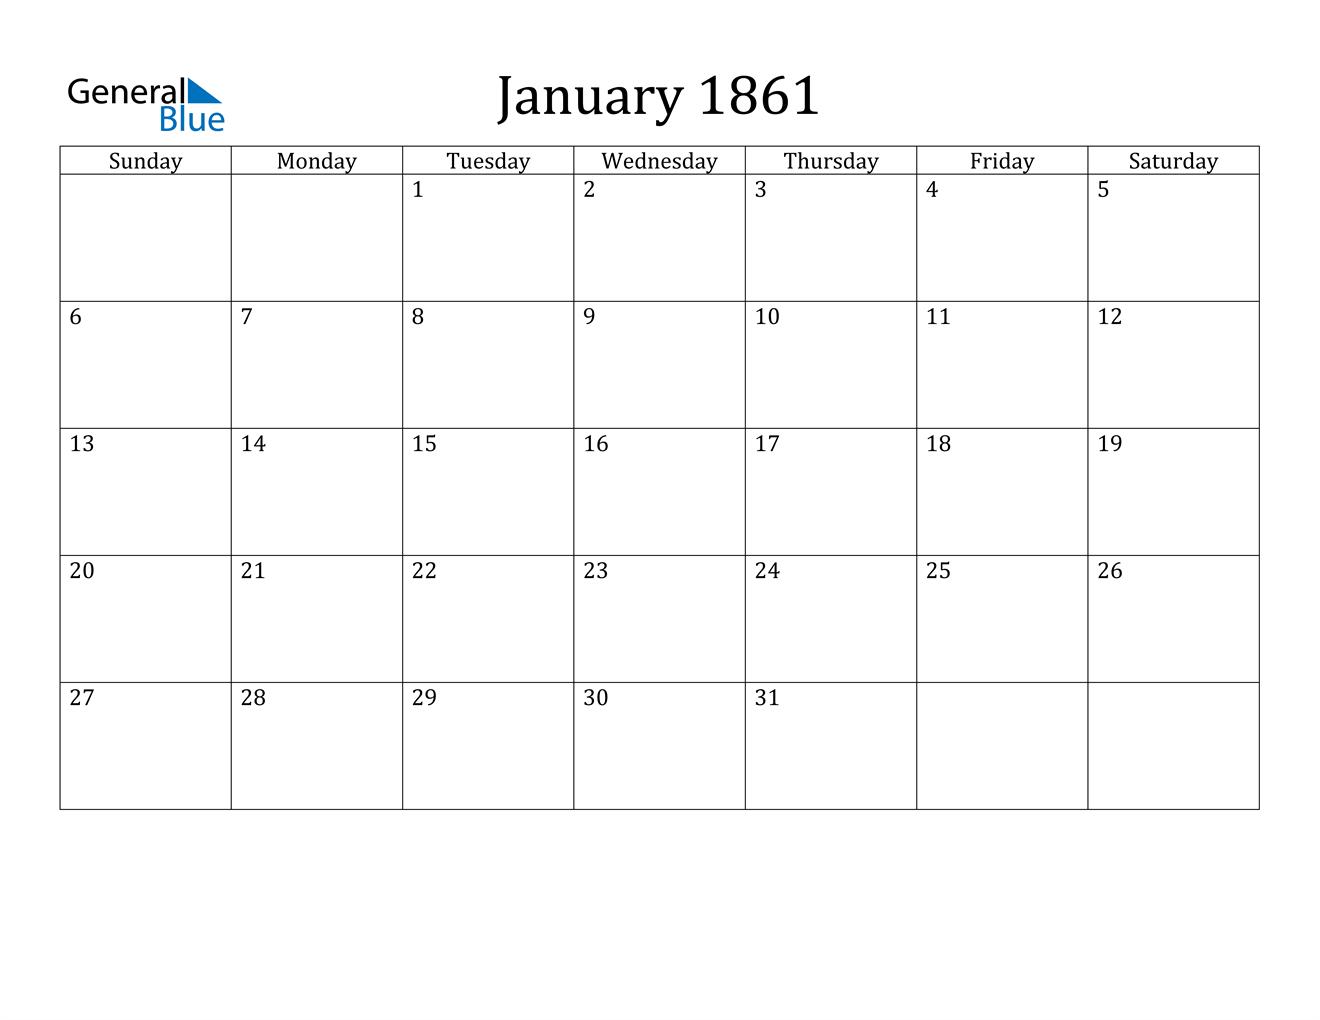 Image of January 1861 Calendar